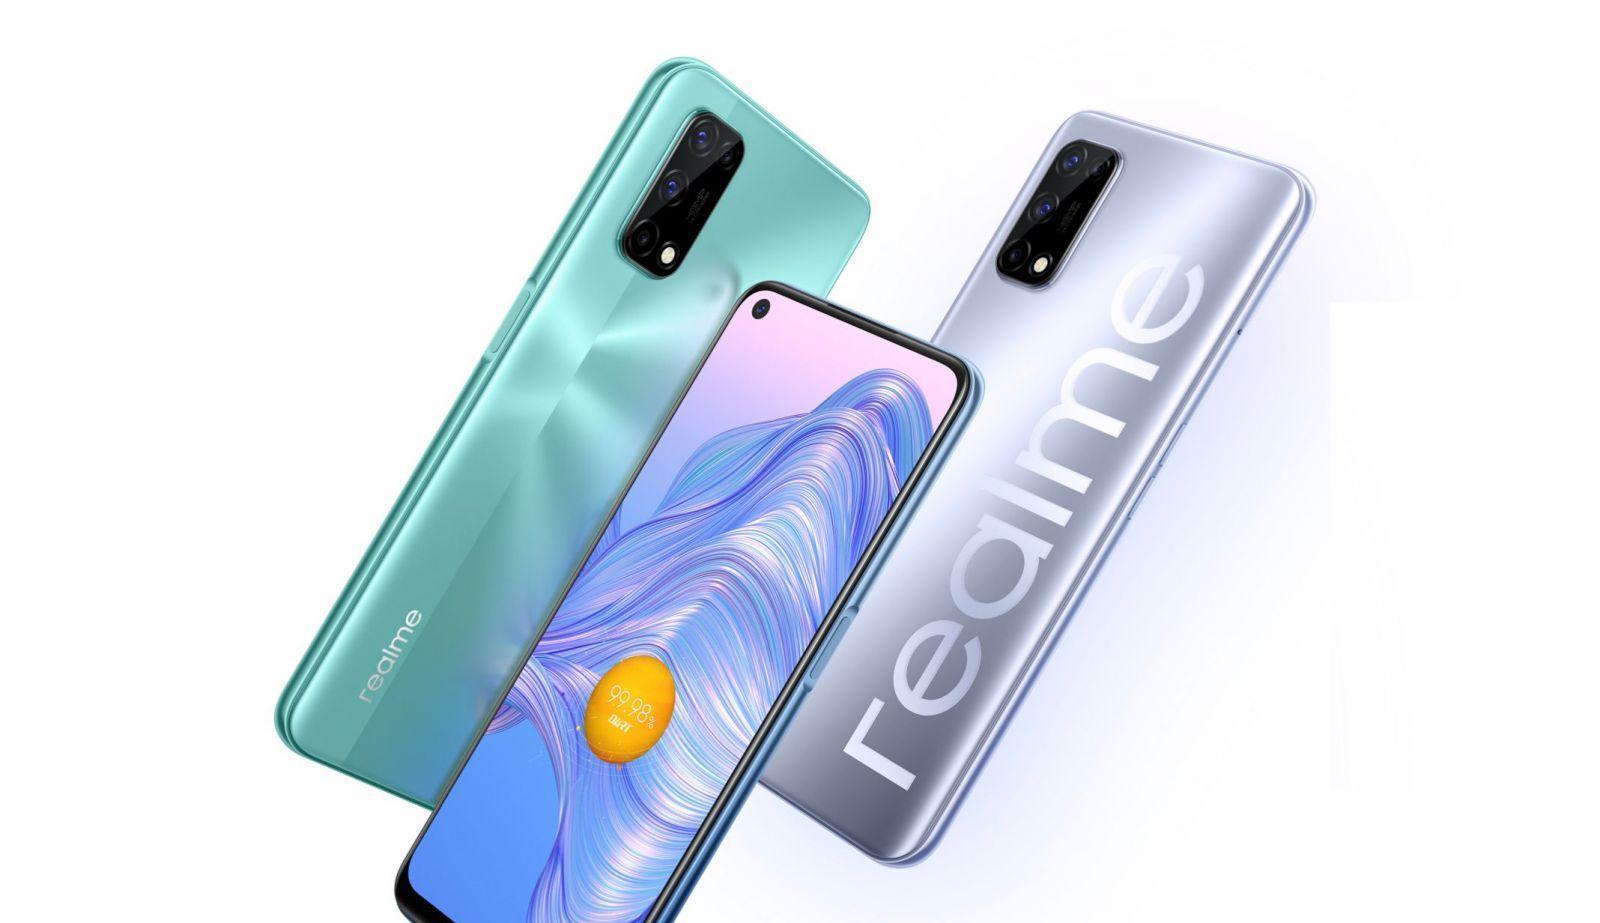 Realme представила смартфон Realme V5 (realme v5 5g featured)